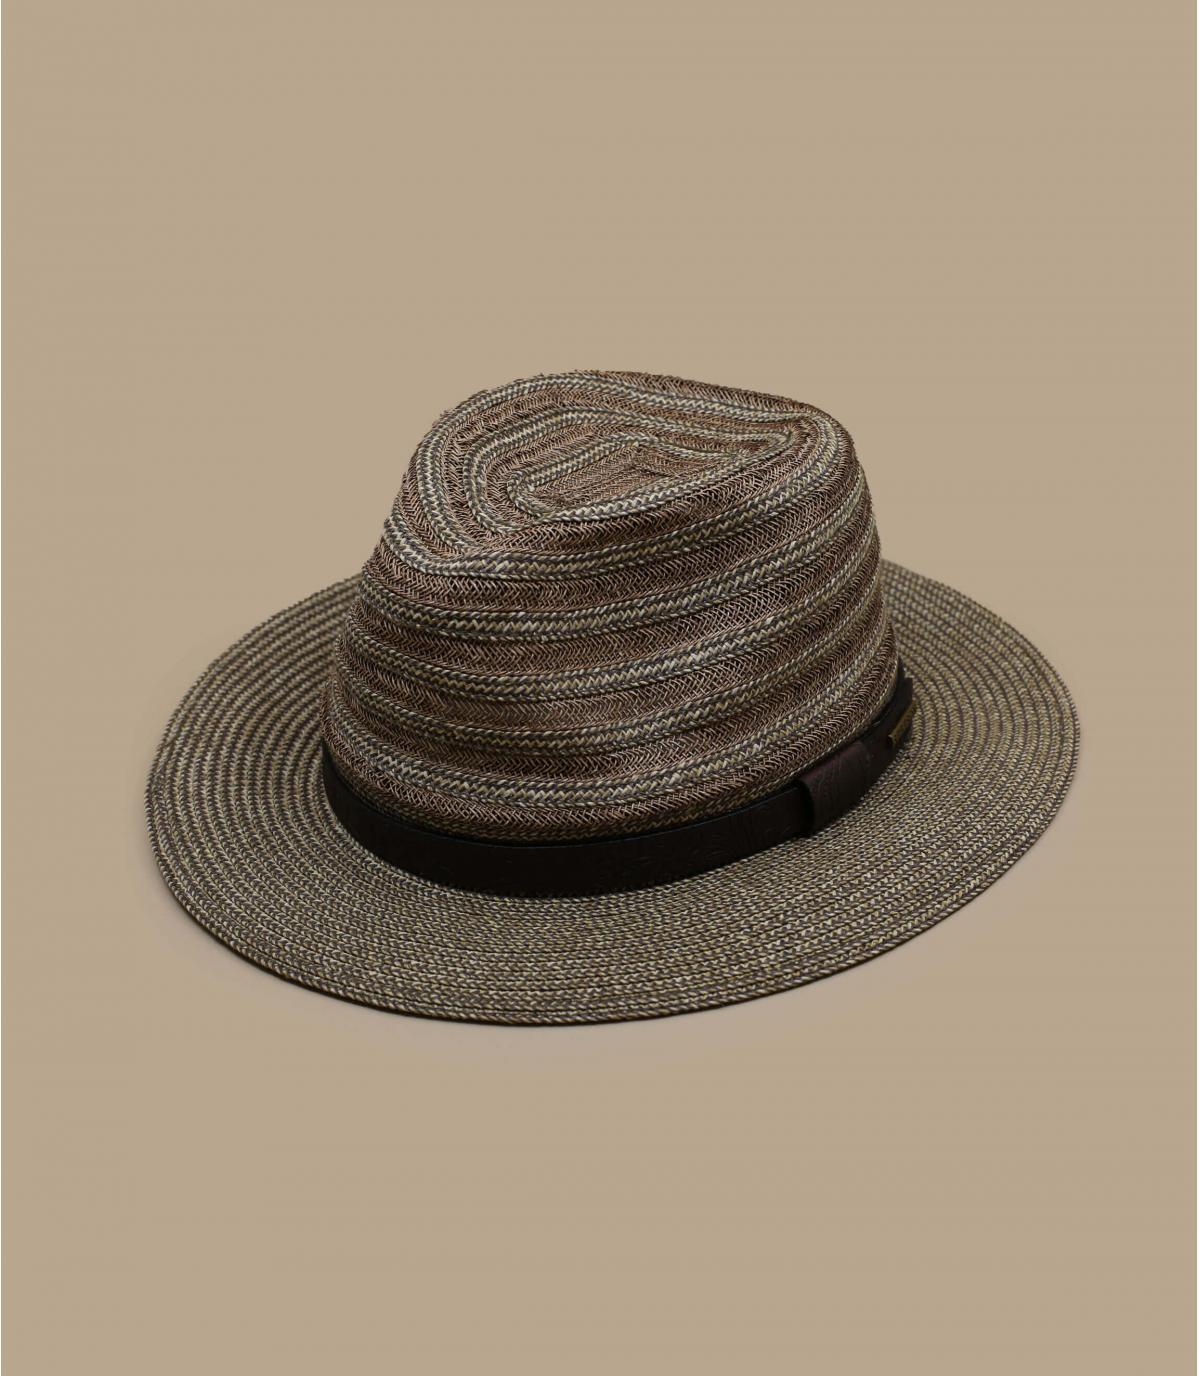 Details Traveller Toyo brown beige - afbeeling 2